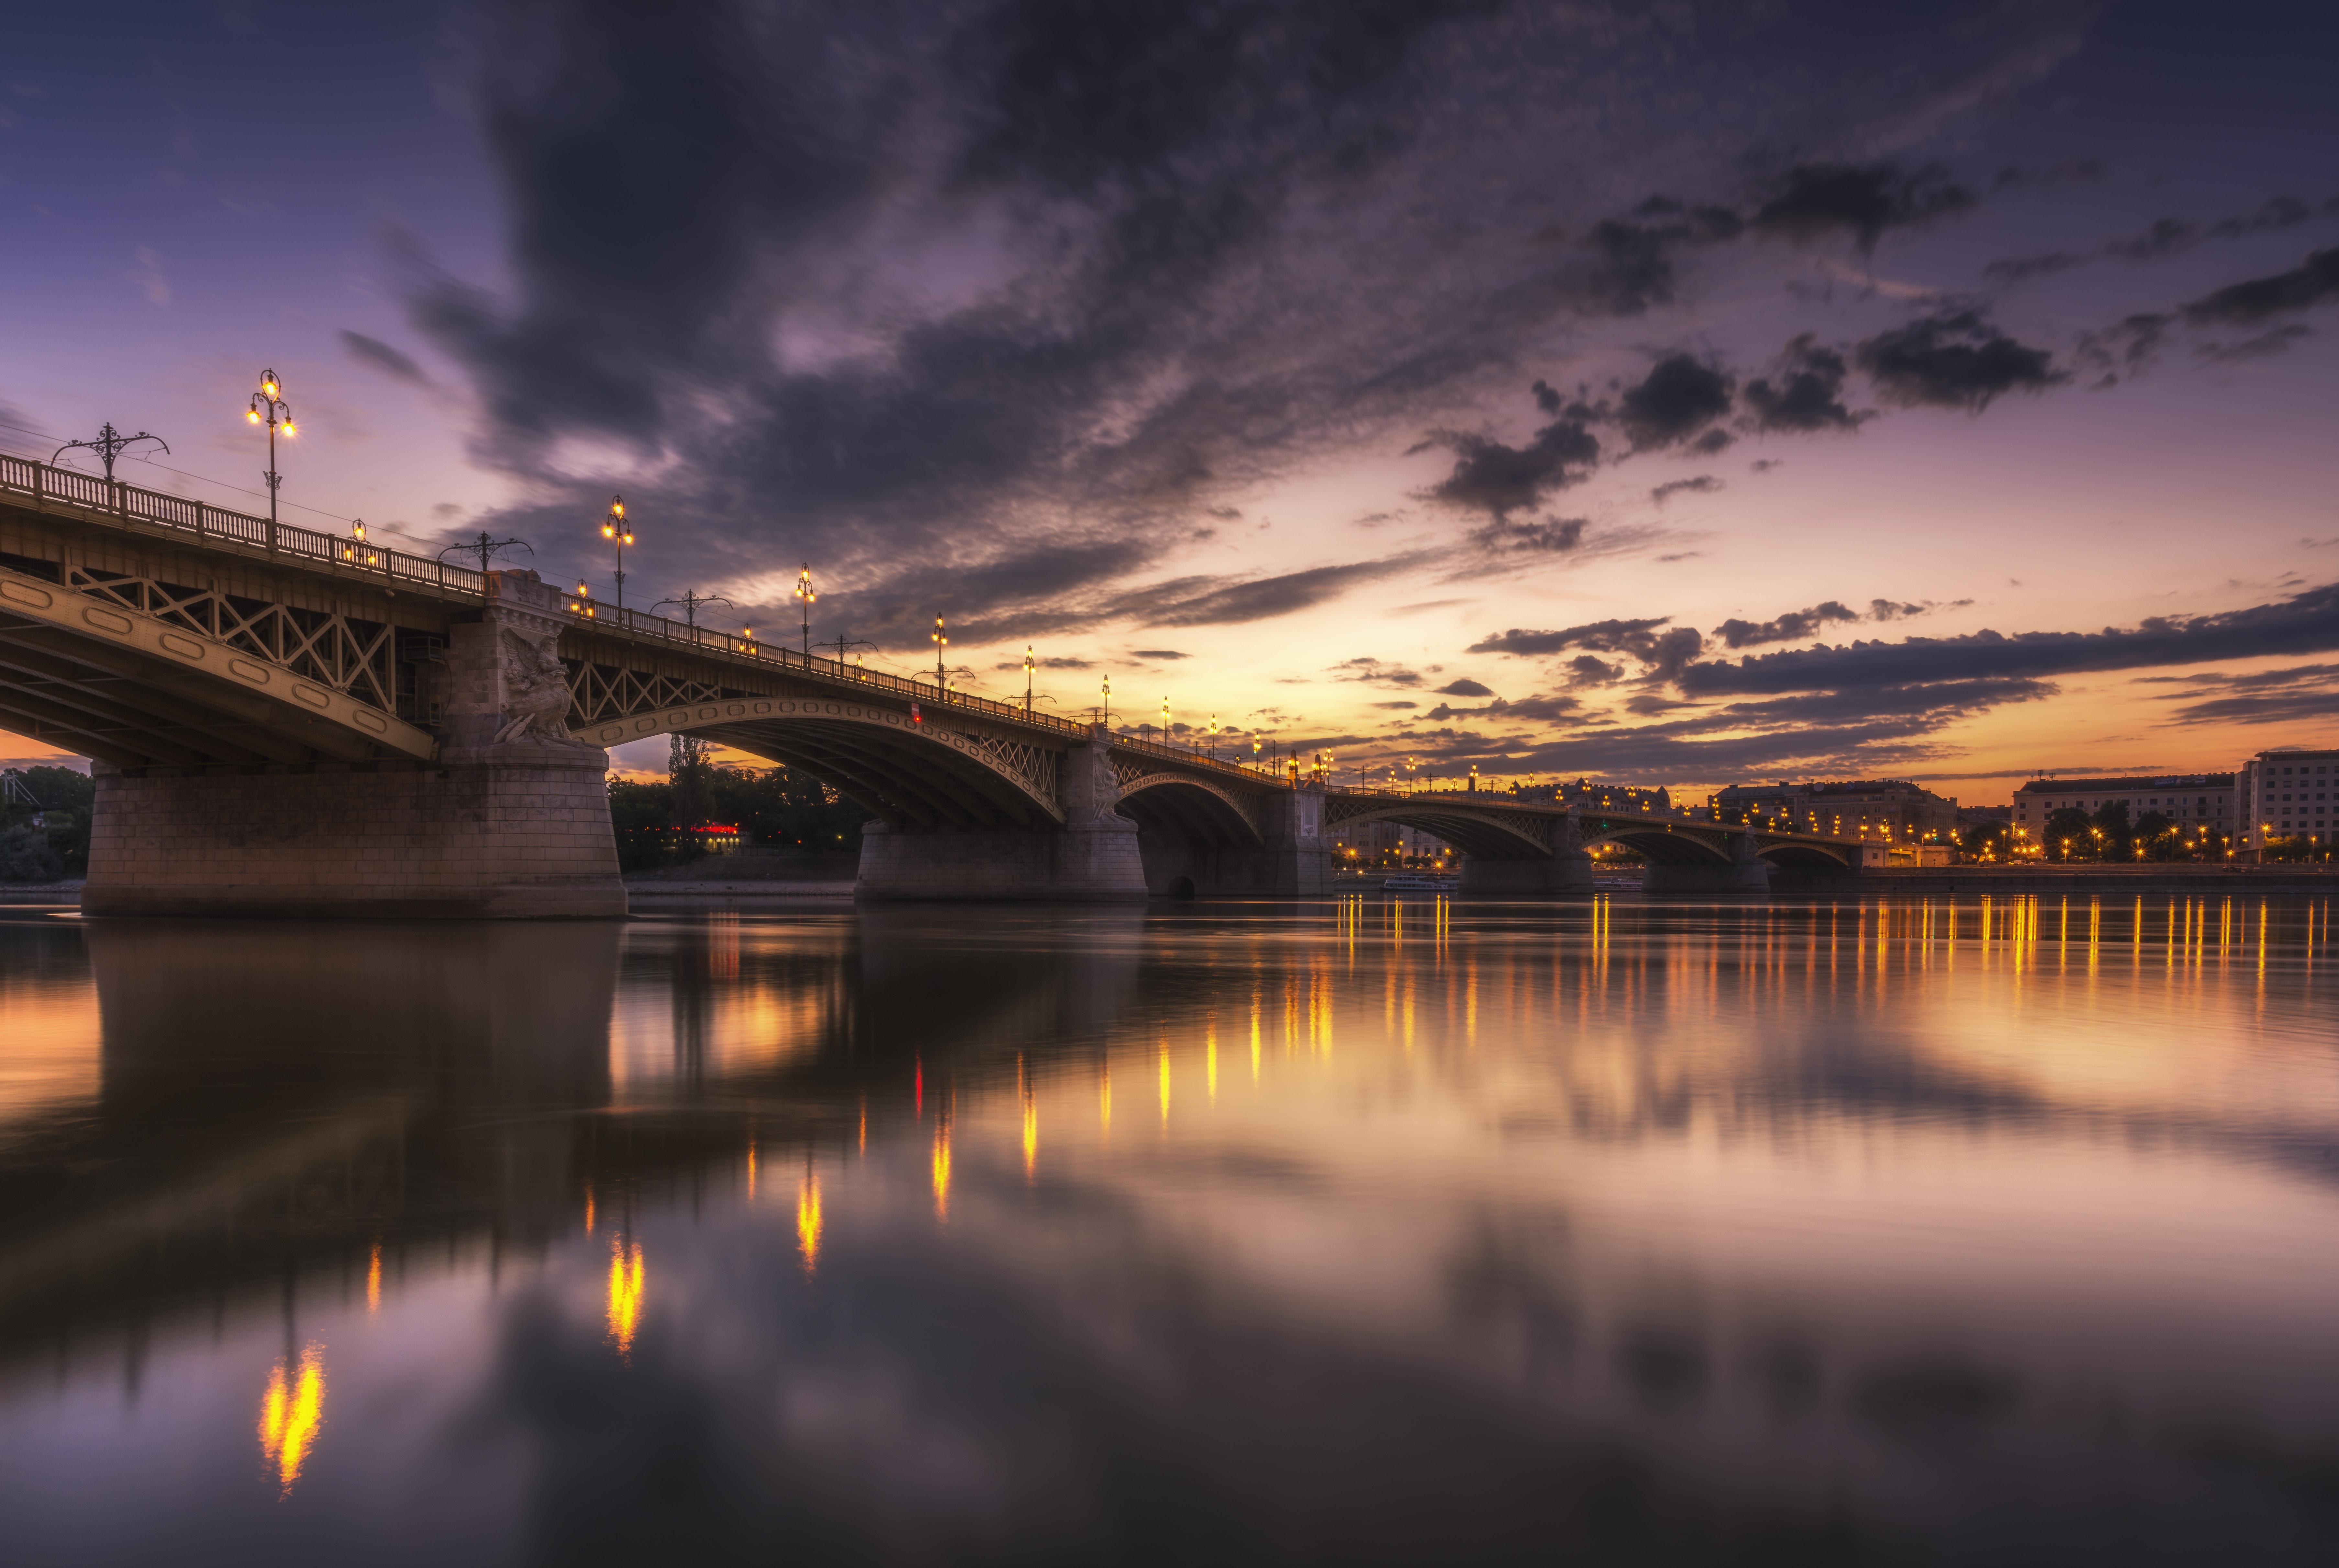 gray concrete bridge under cloudy sky